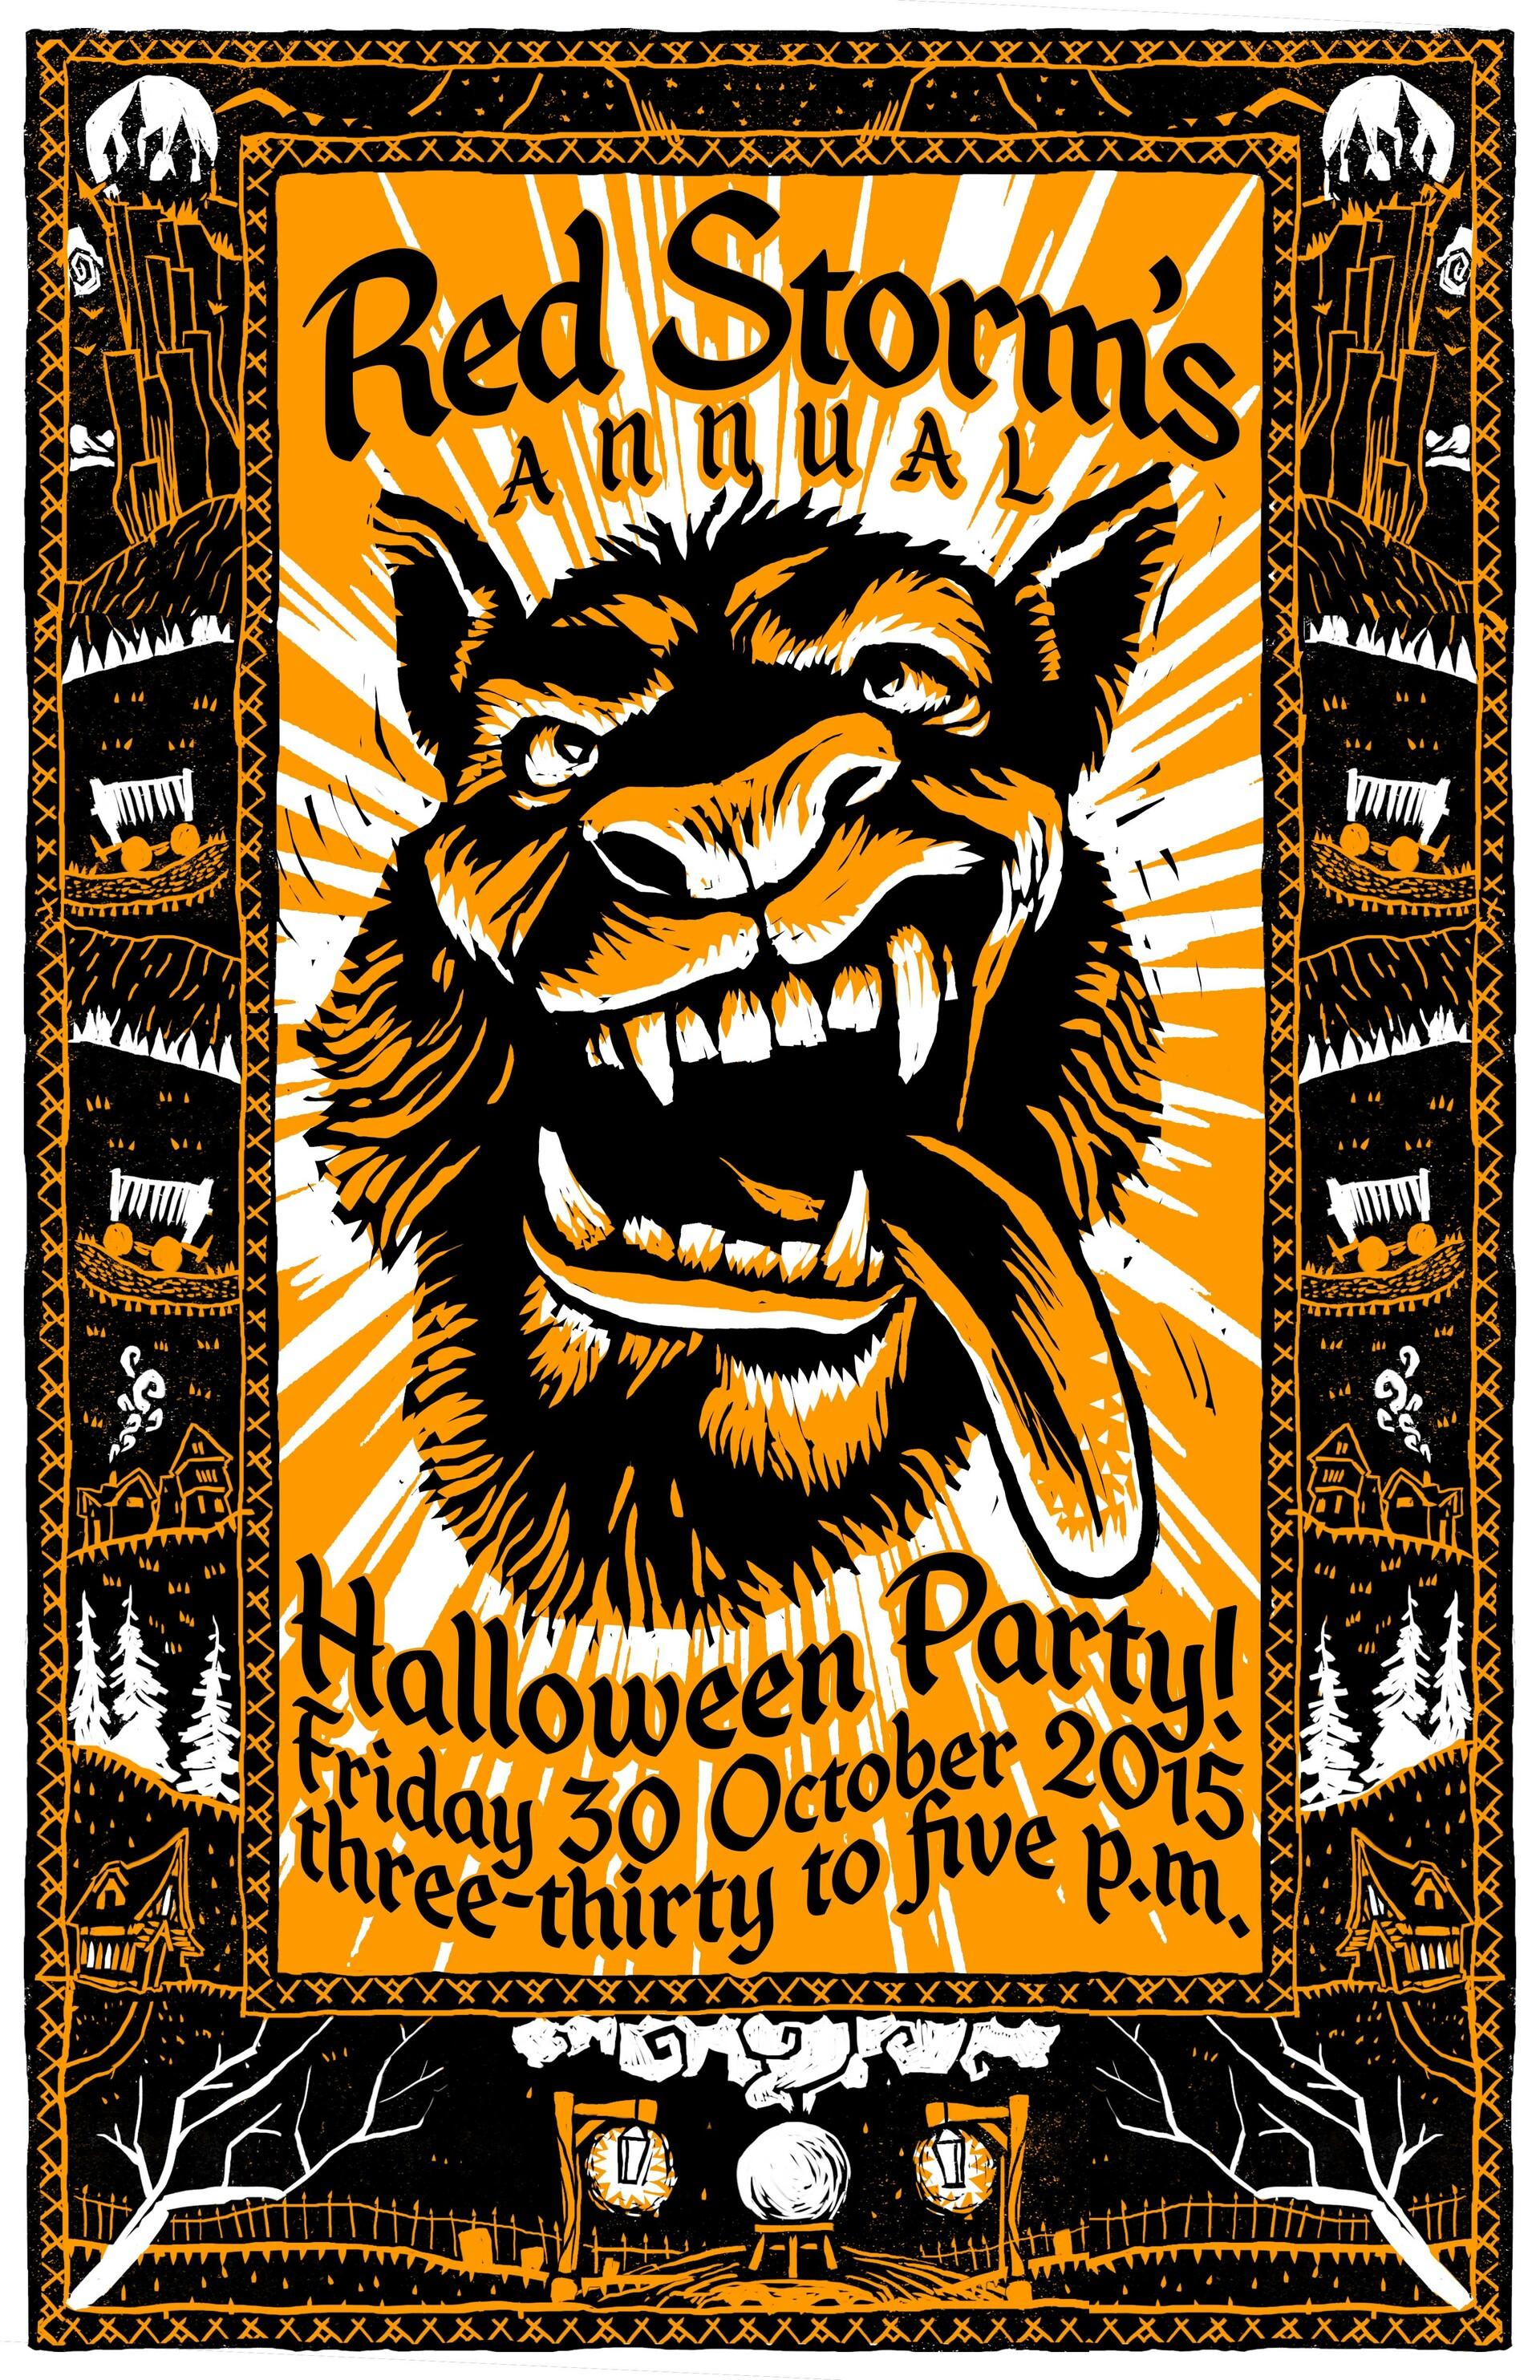 Andy foltz 2015 halloween poster